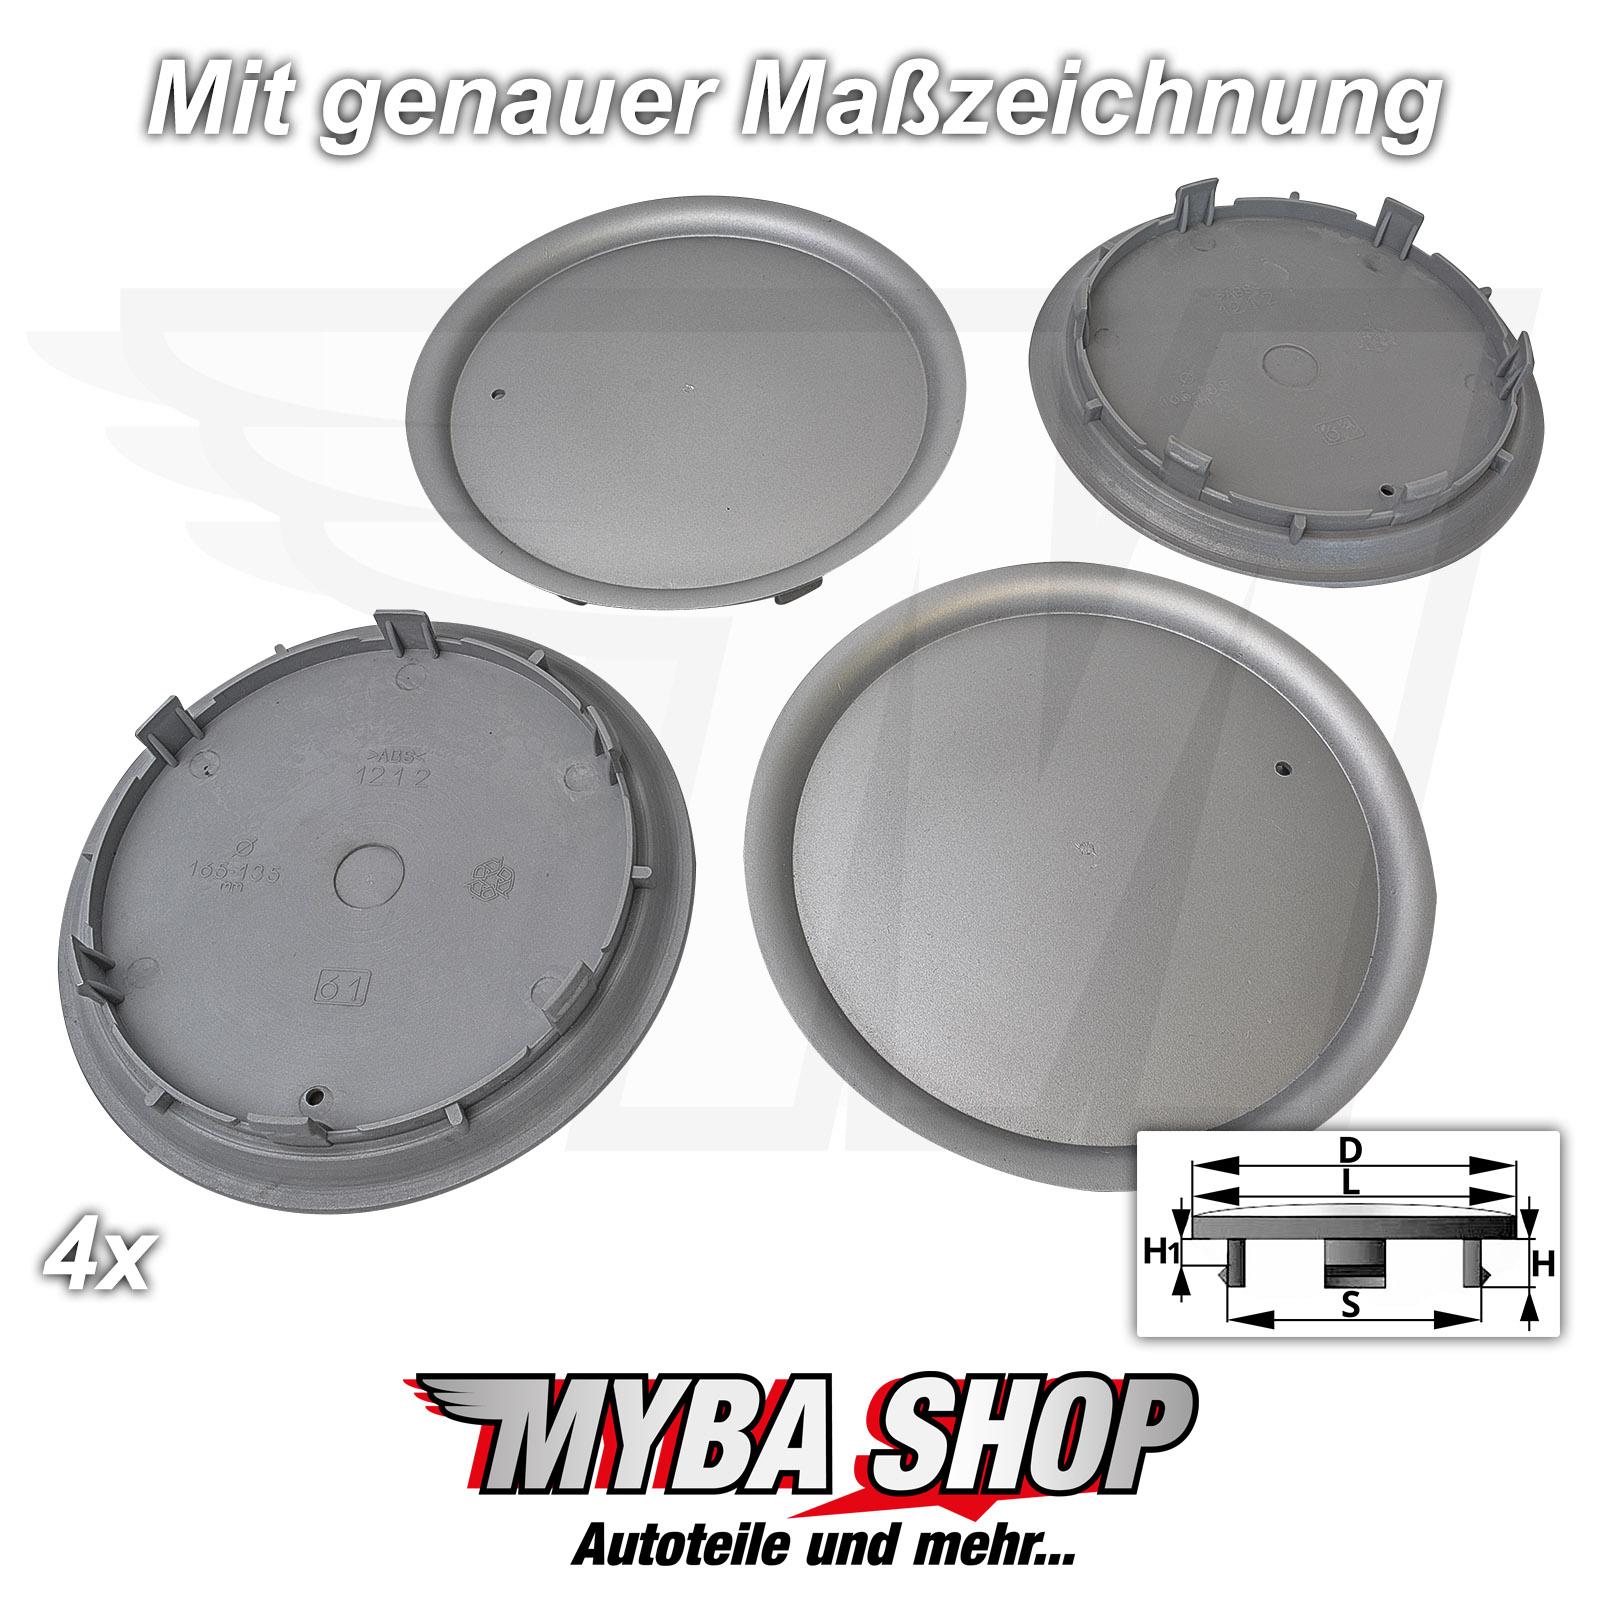 4x tapacubos embellecedores 147 mm//60 mm llantas tapa radnabende para VW NUEVO